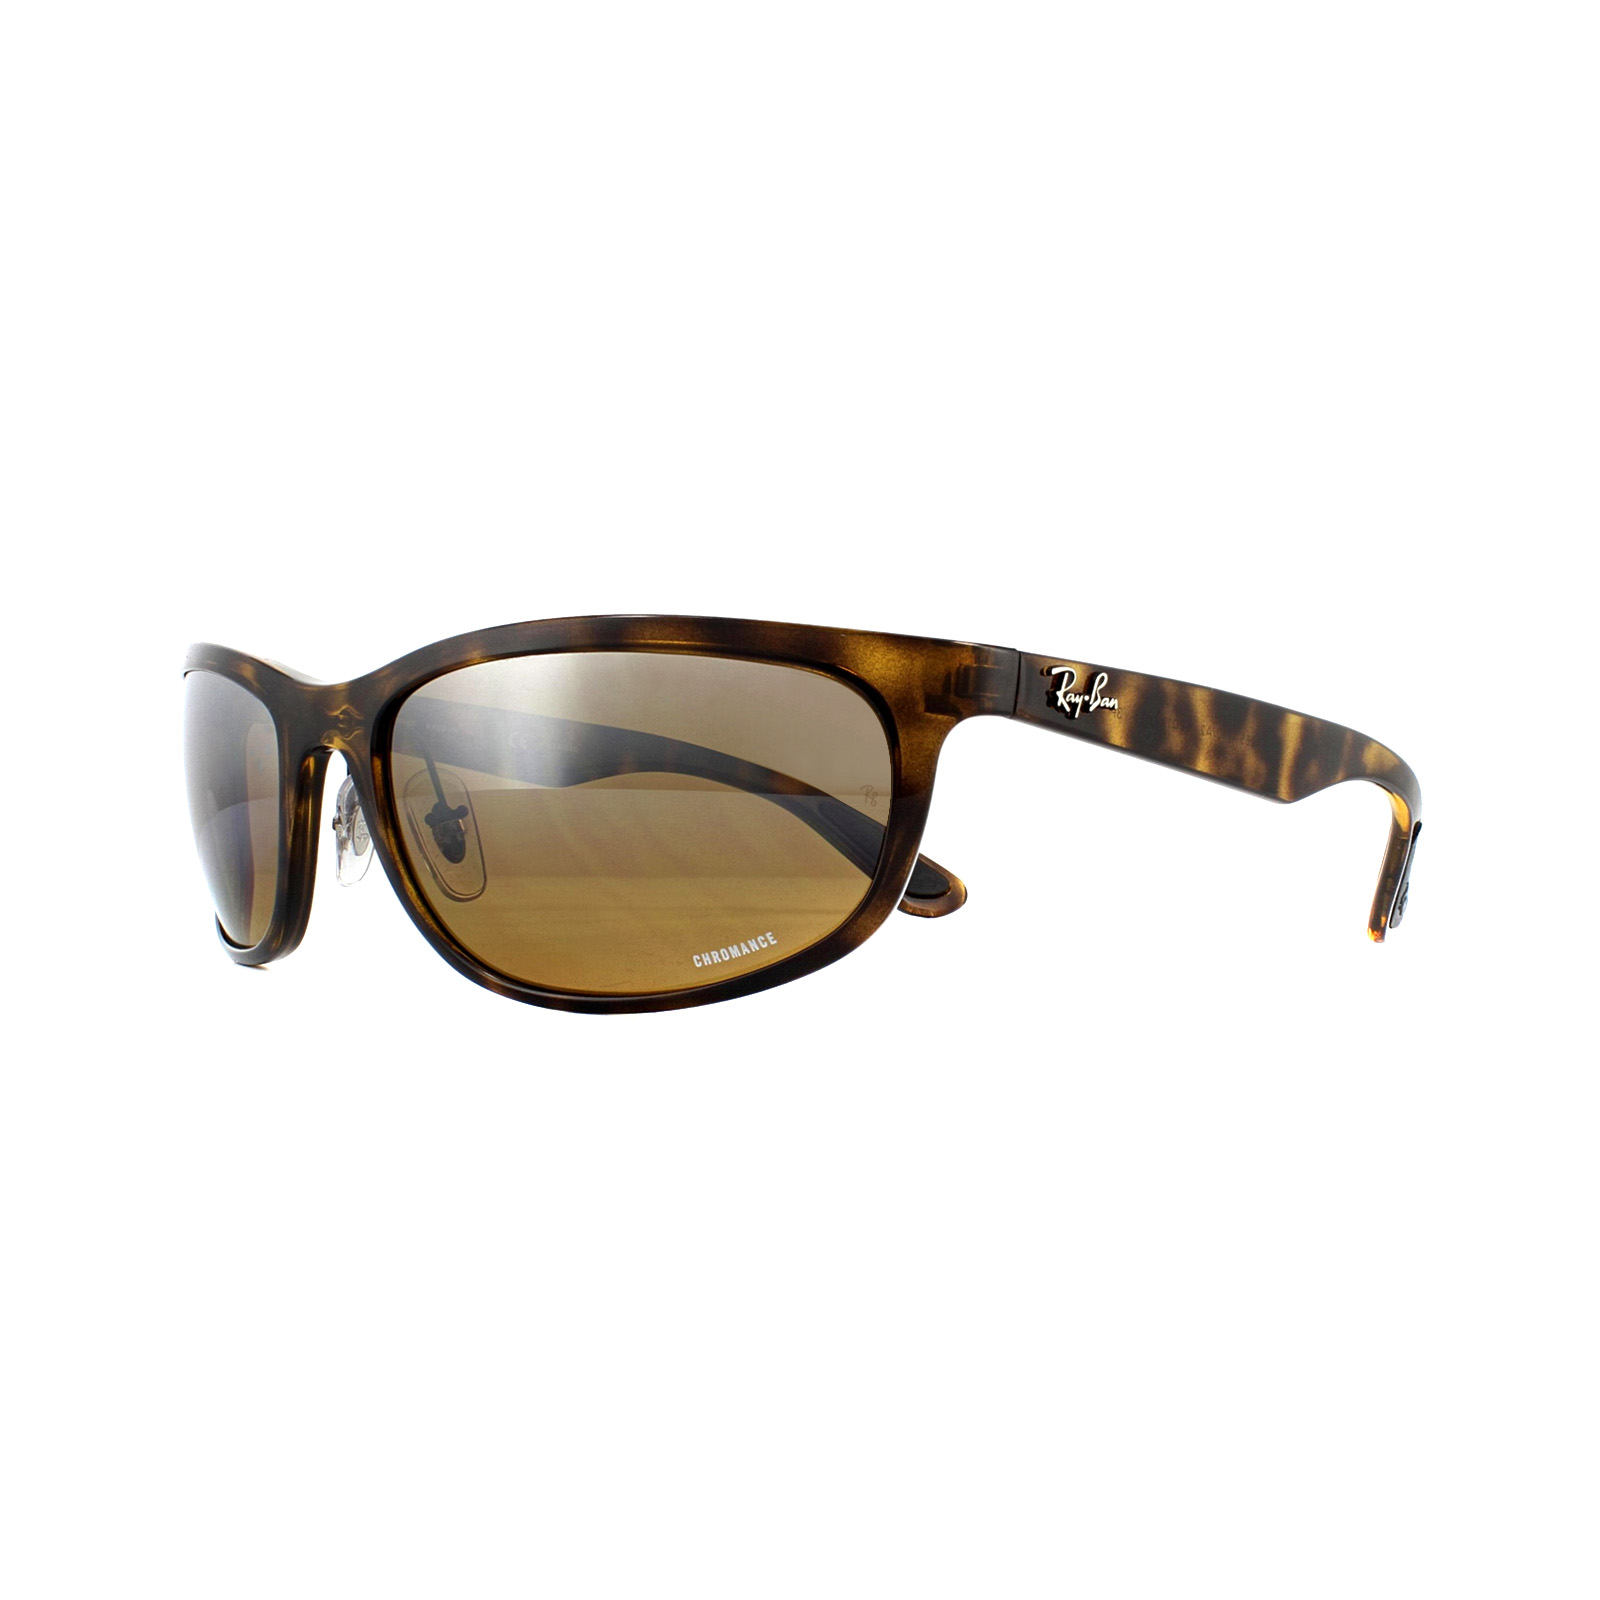 1dbebbbdd0 ... Ray-Ban RB4265 Chromance Sunglasses Thumbnail 2 ...